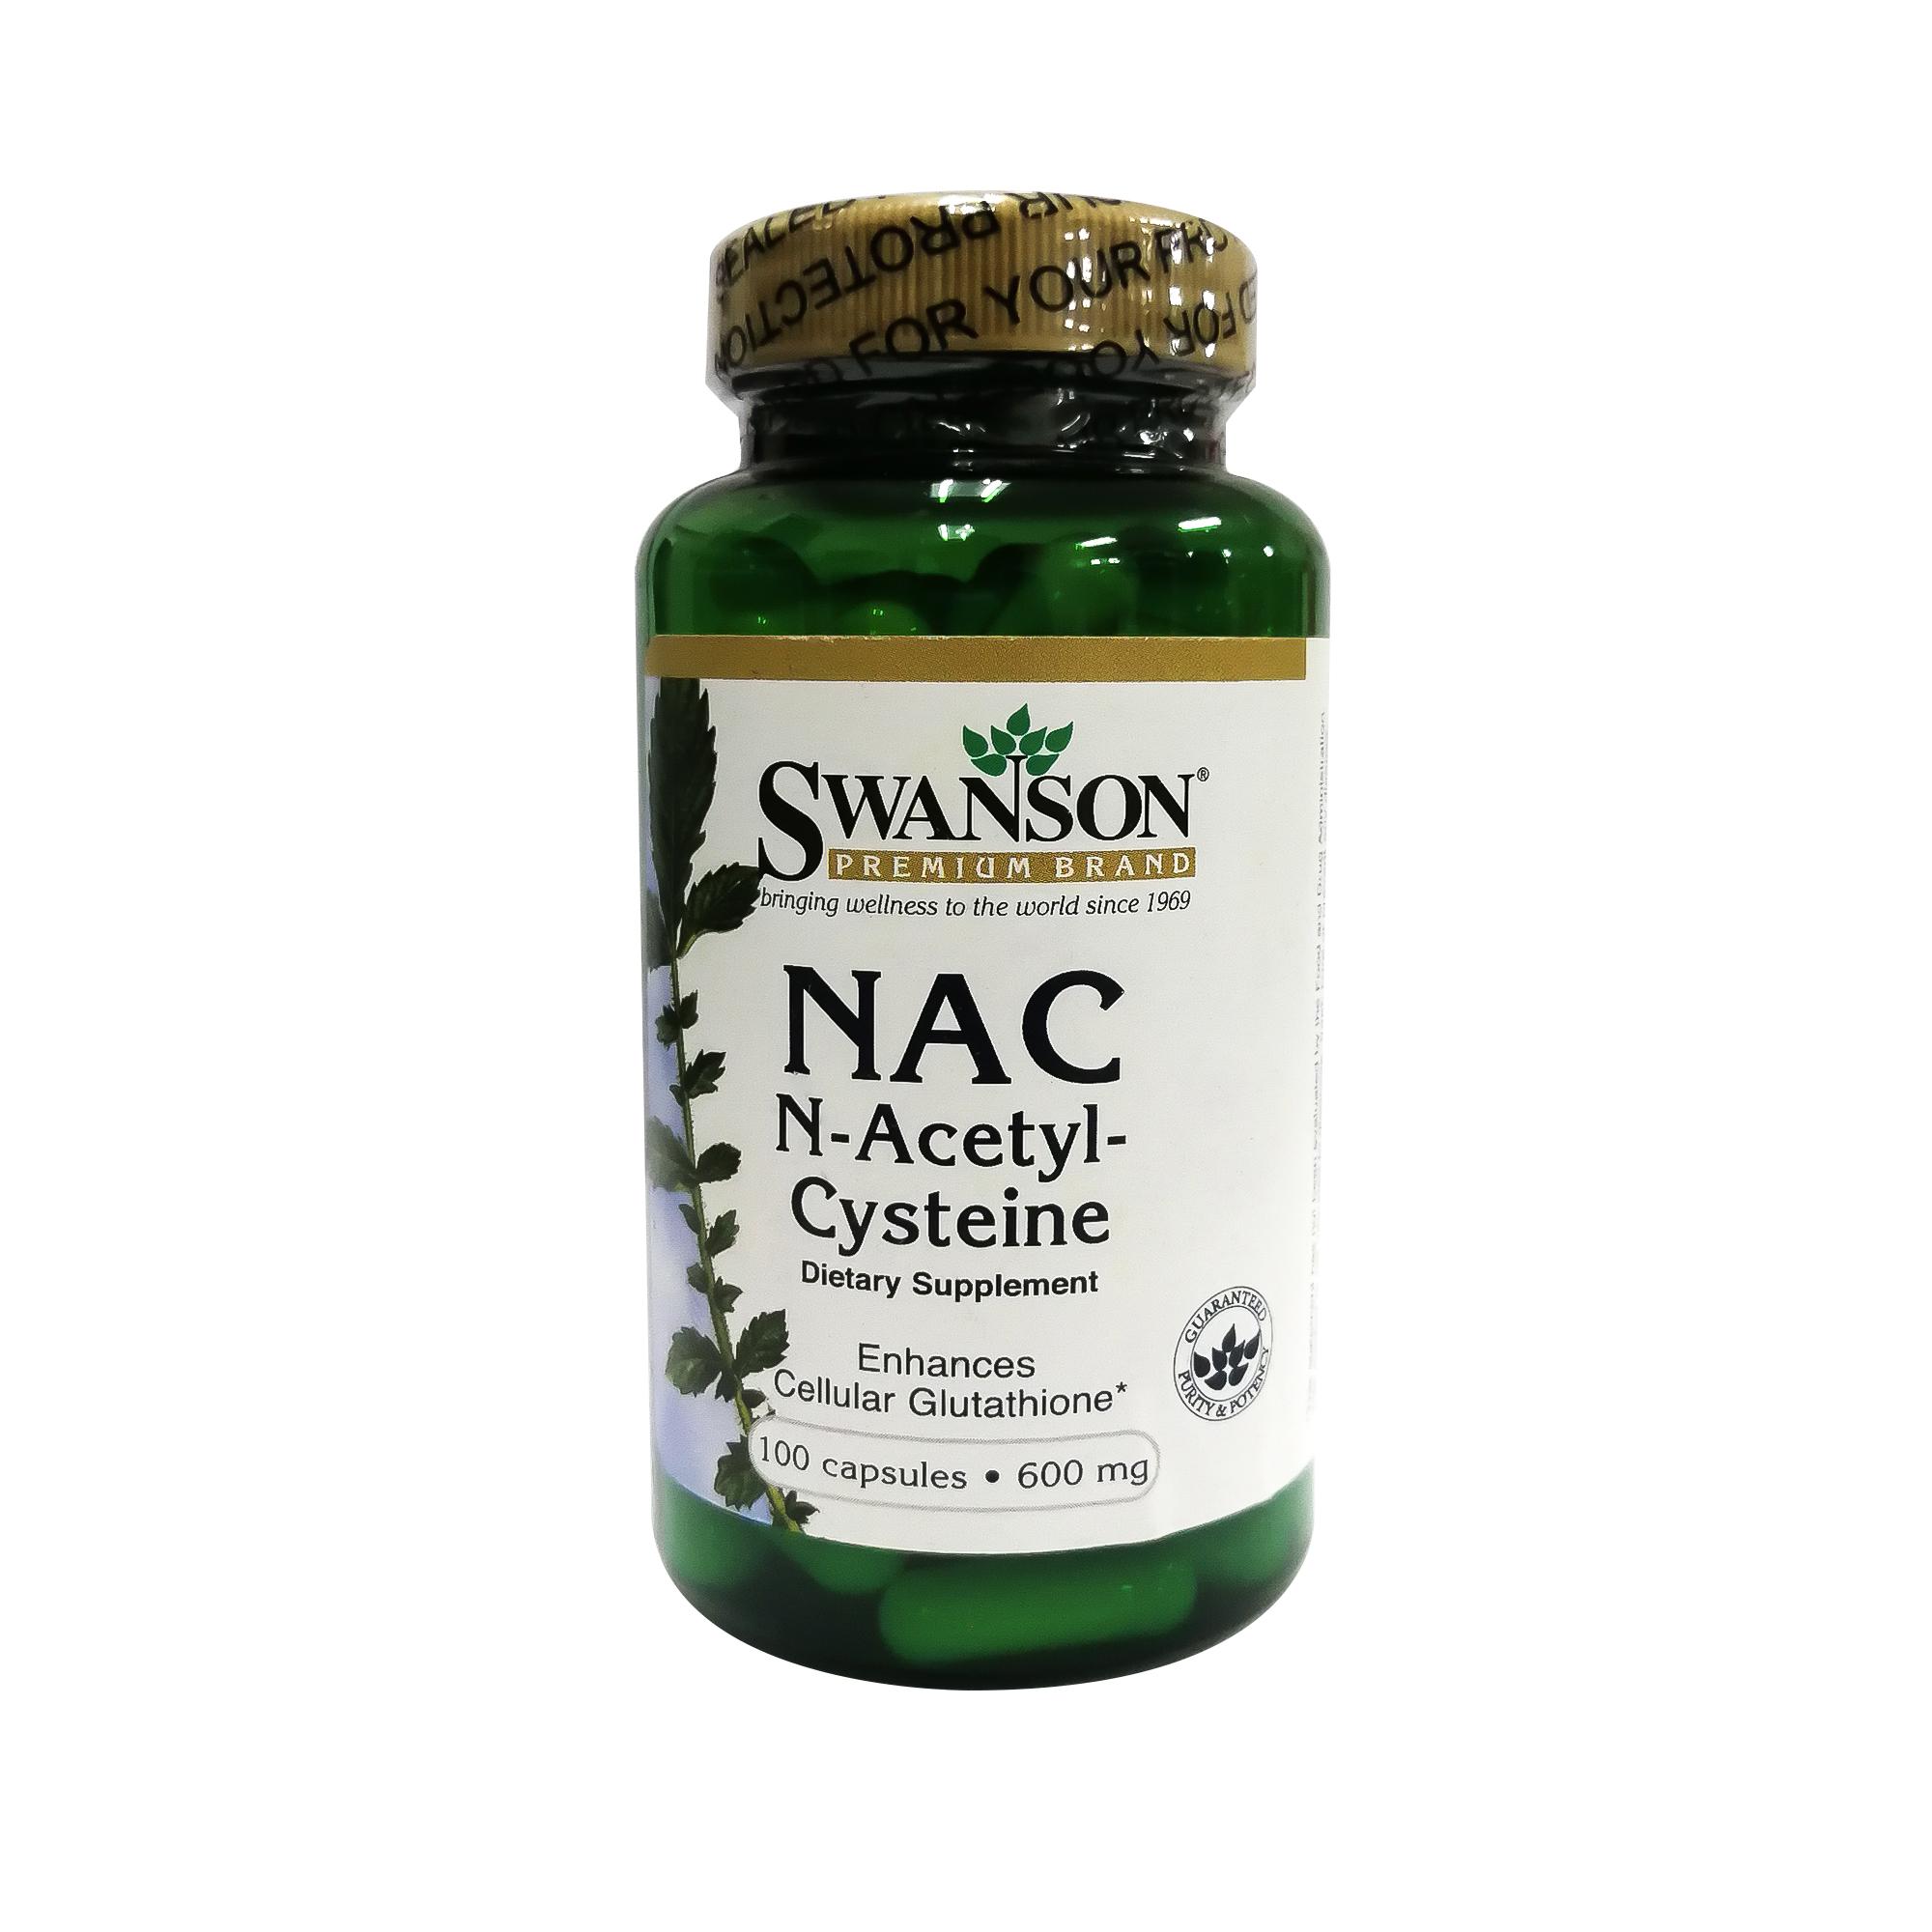 (S-2) NAC N-Acetyl Cysteine แน็ค (100เม็ด/ขวด)